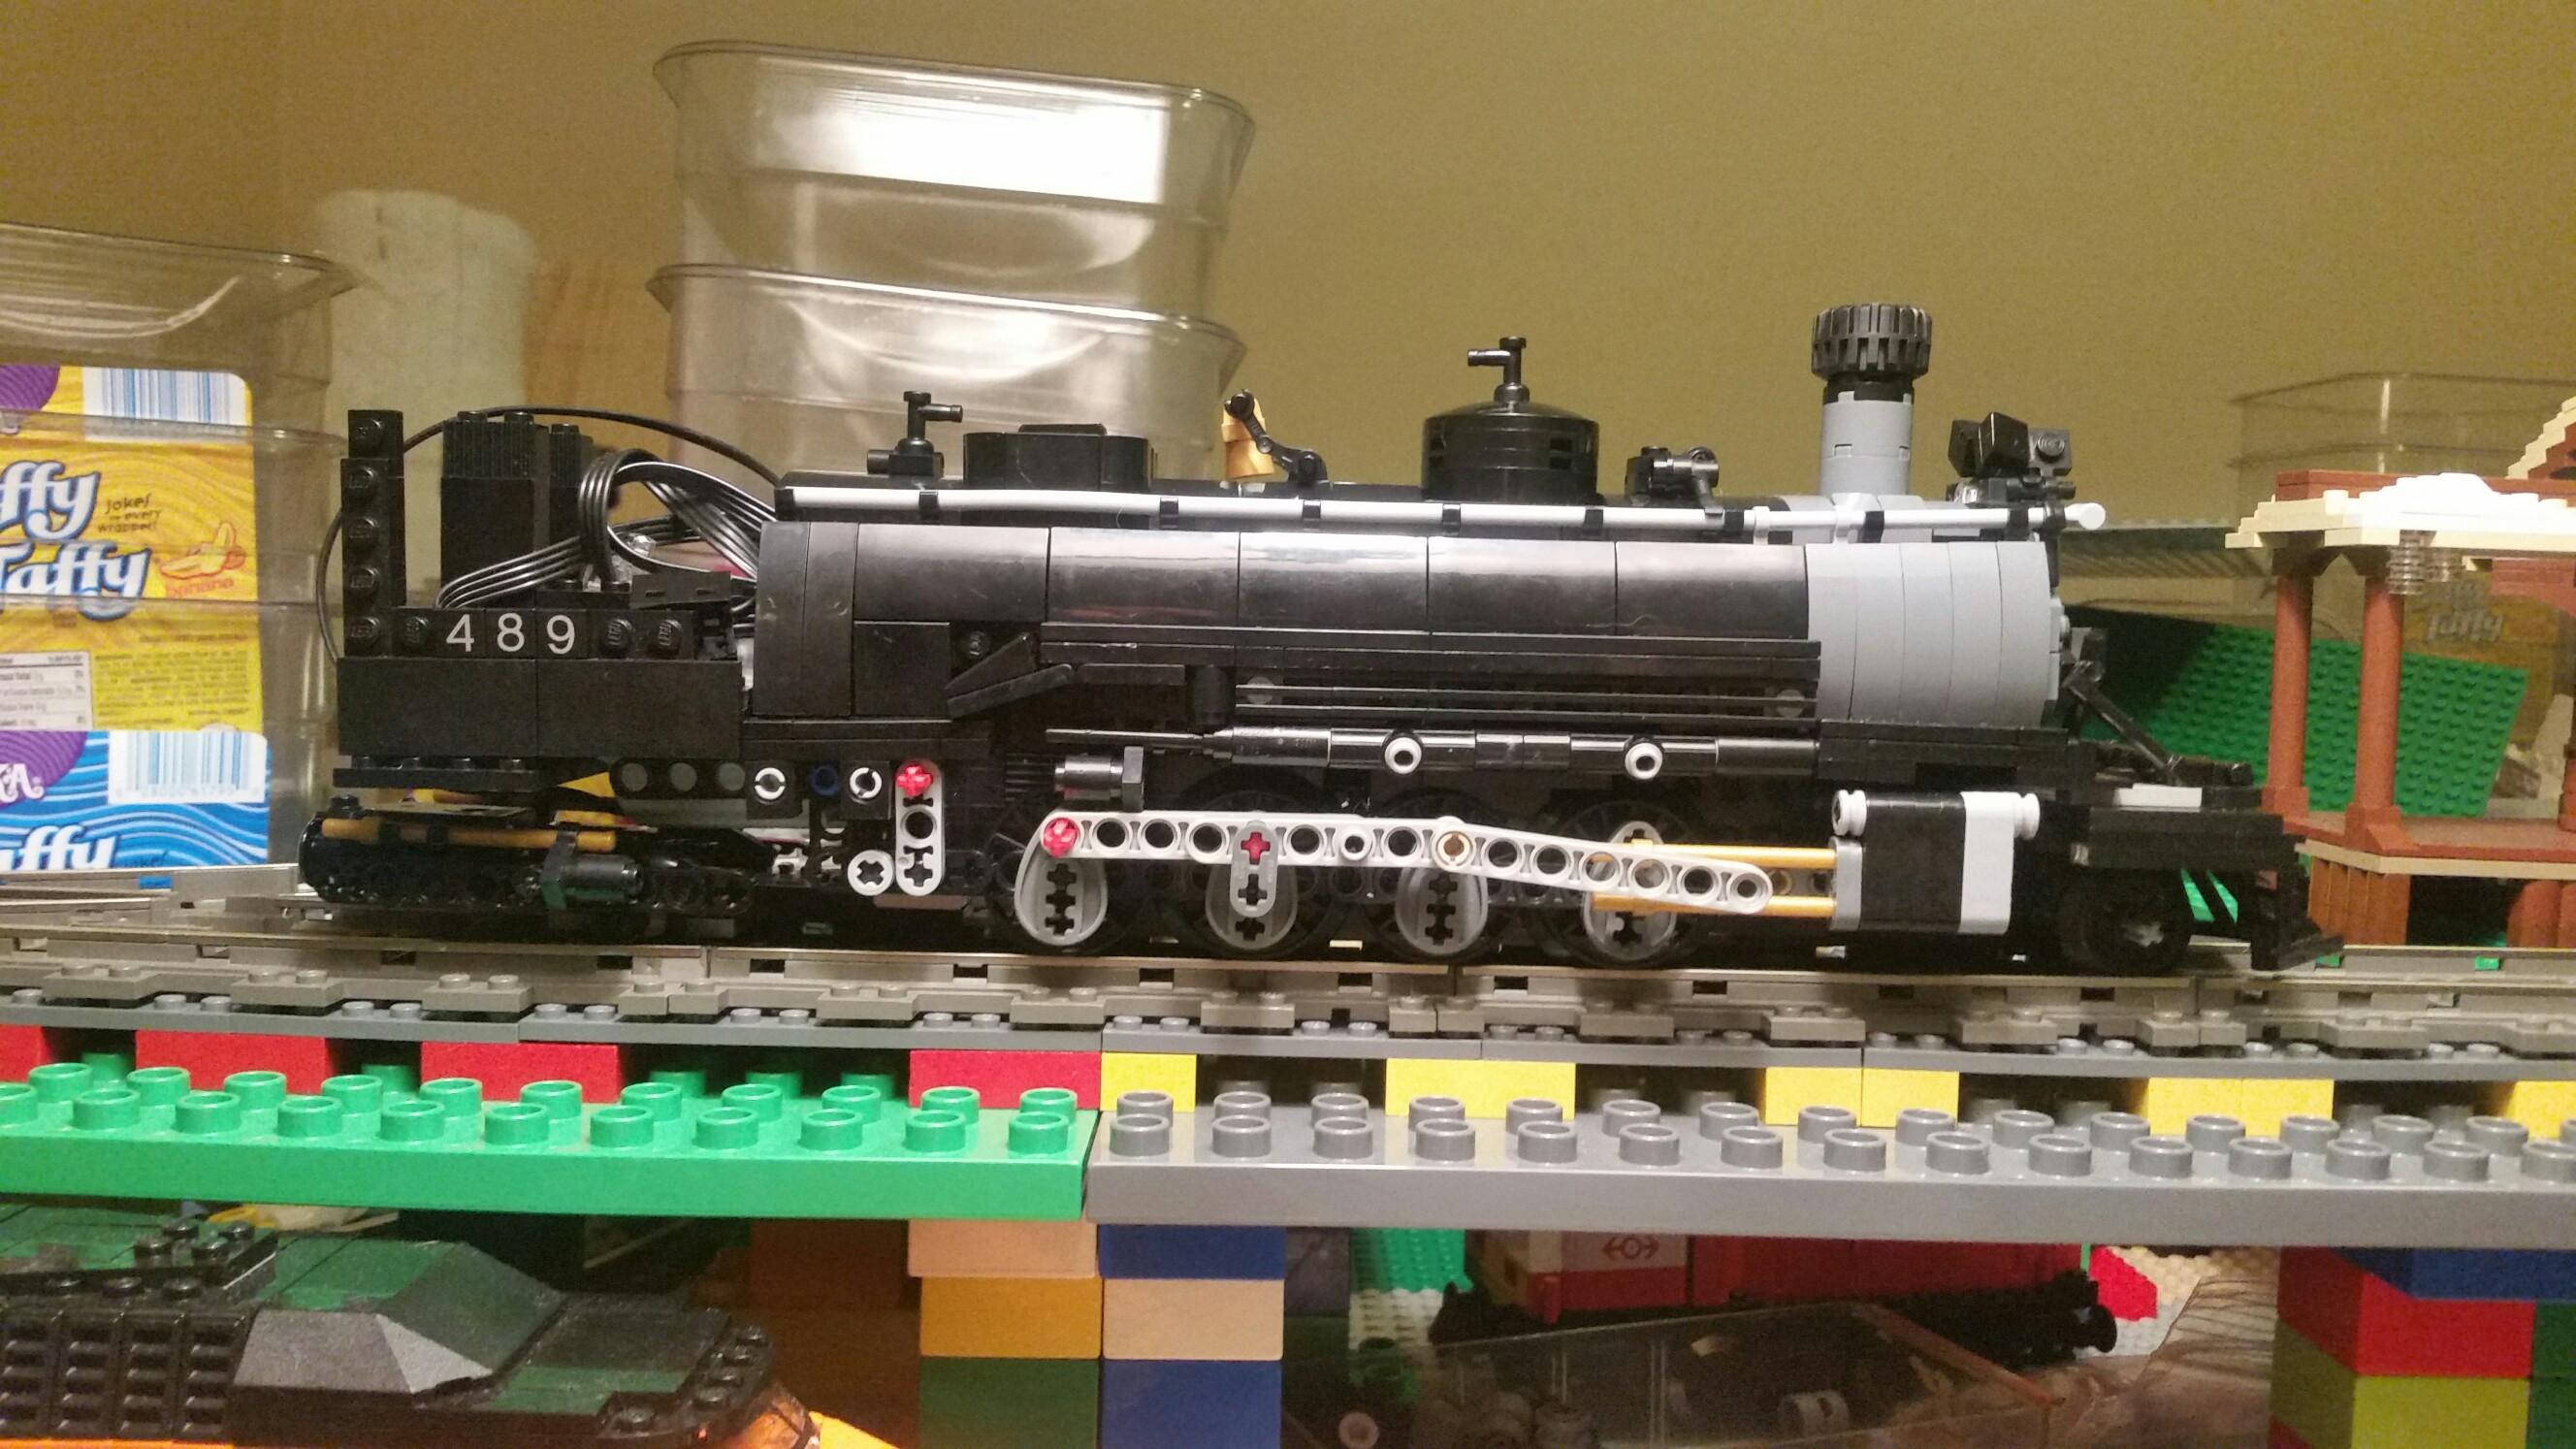 engine_9-2656x1494.jpg